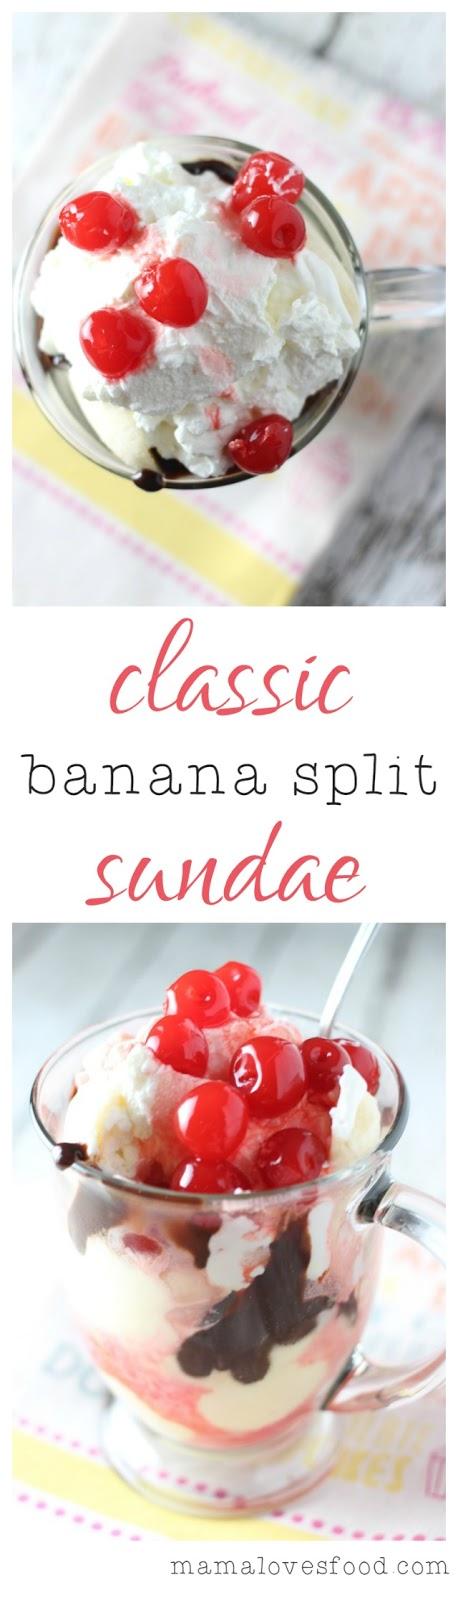 Classic Banana Split Sundae